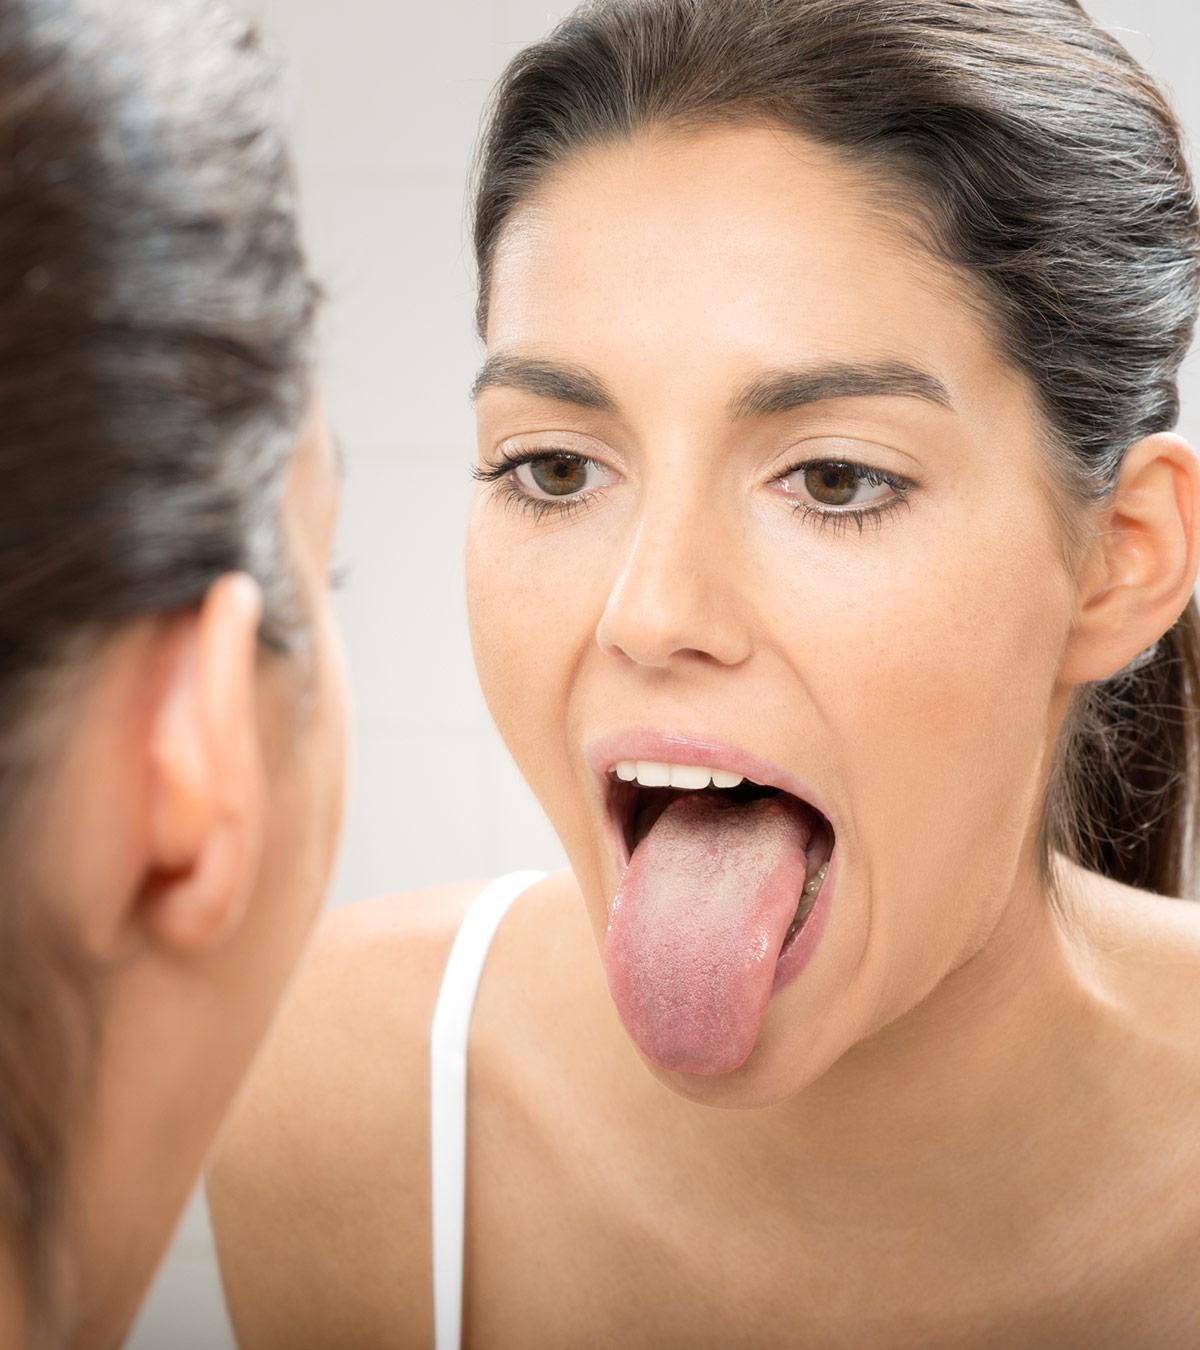 Tongue Sores During Pregnancy - Causes, Symptoms & Treatments